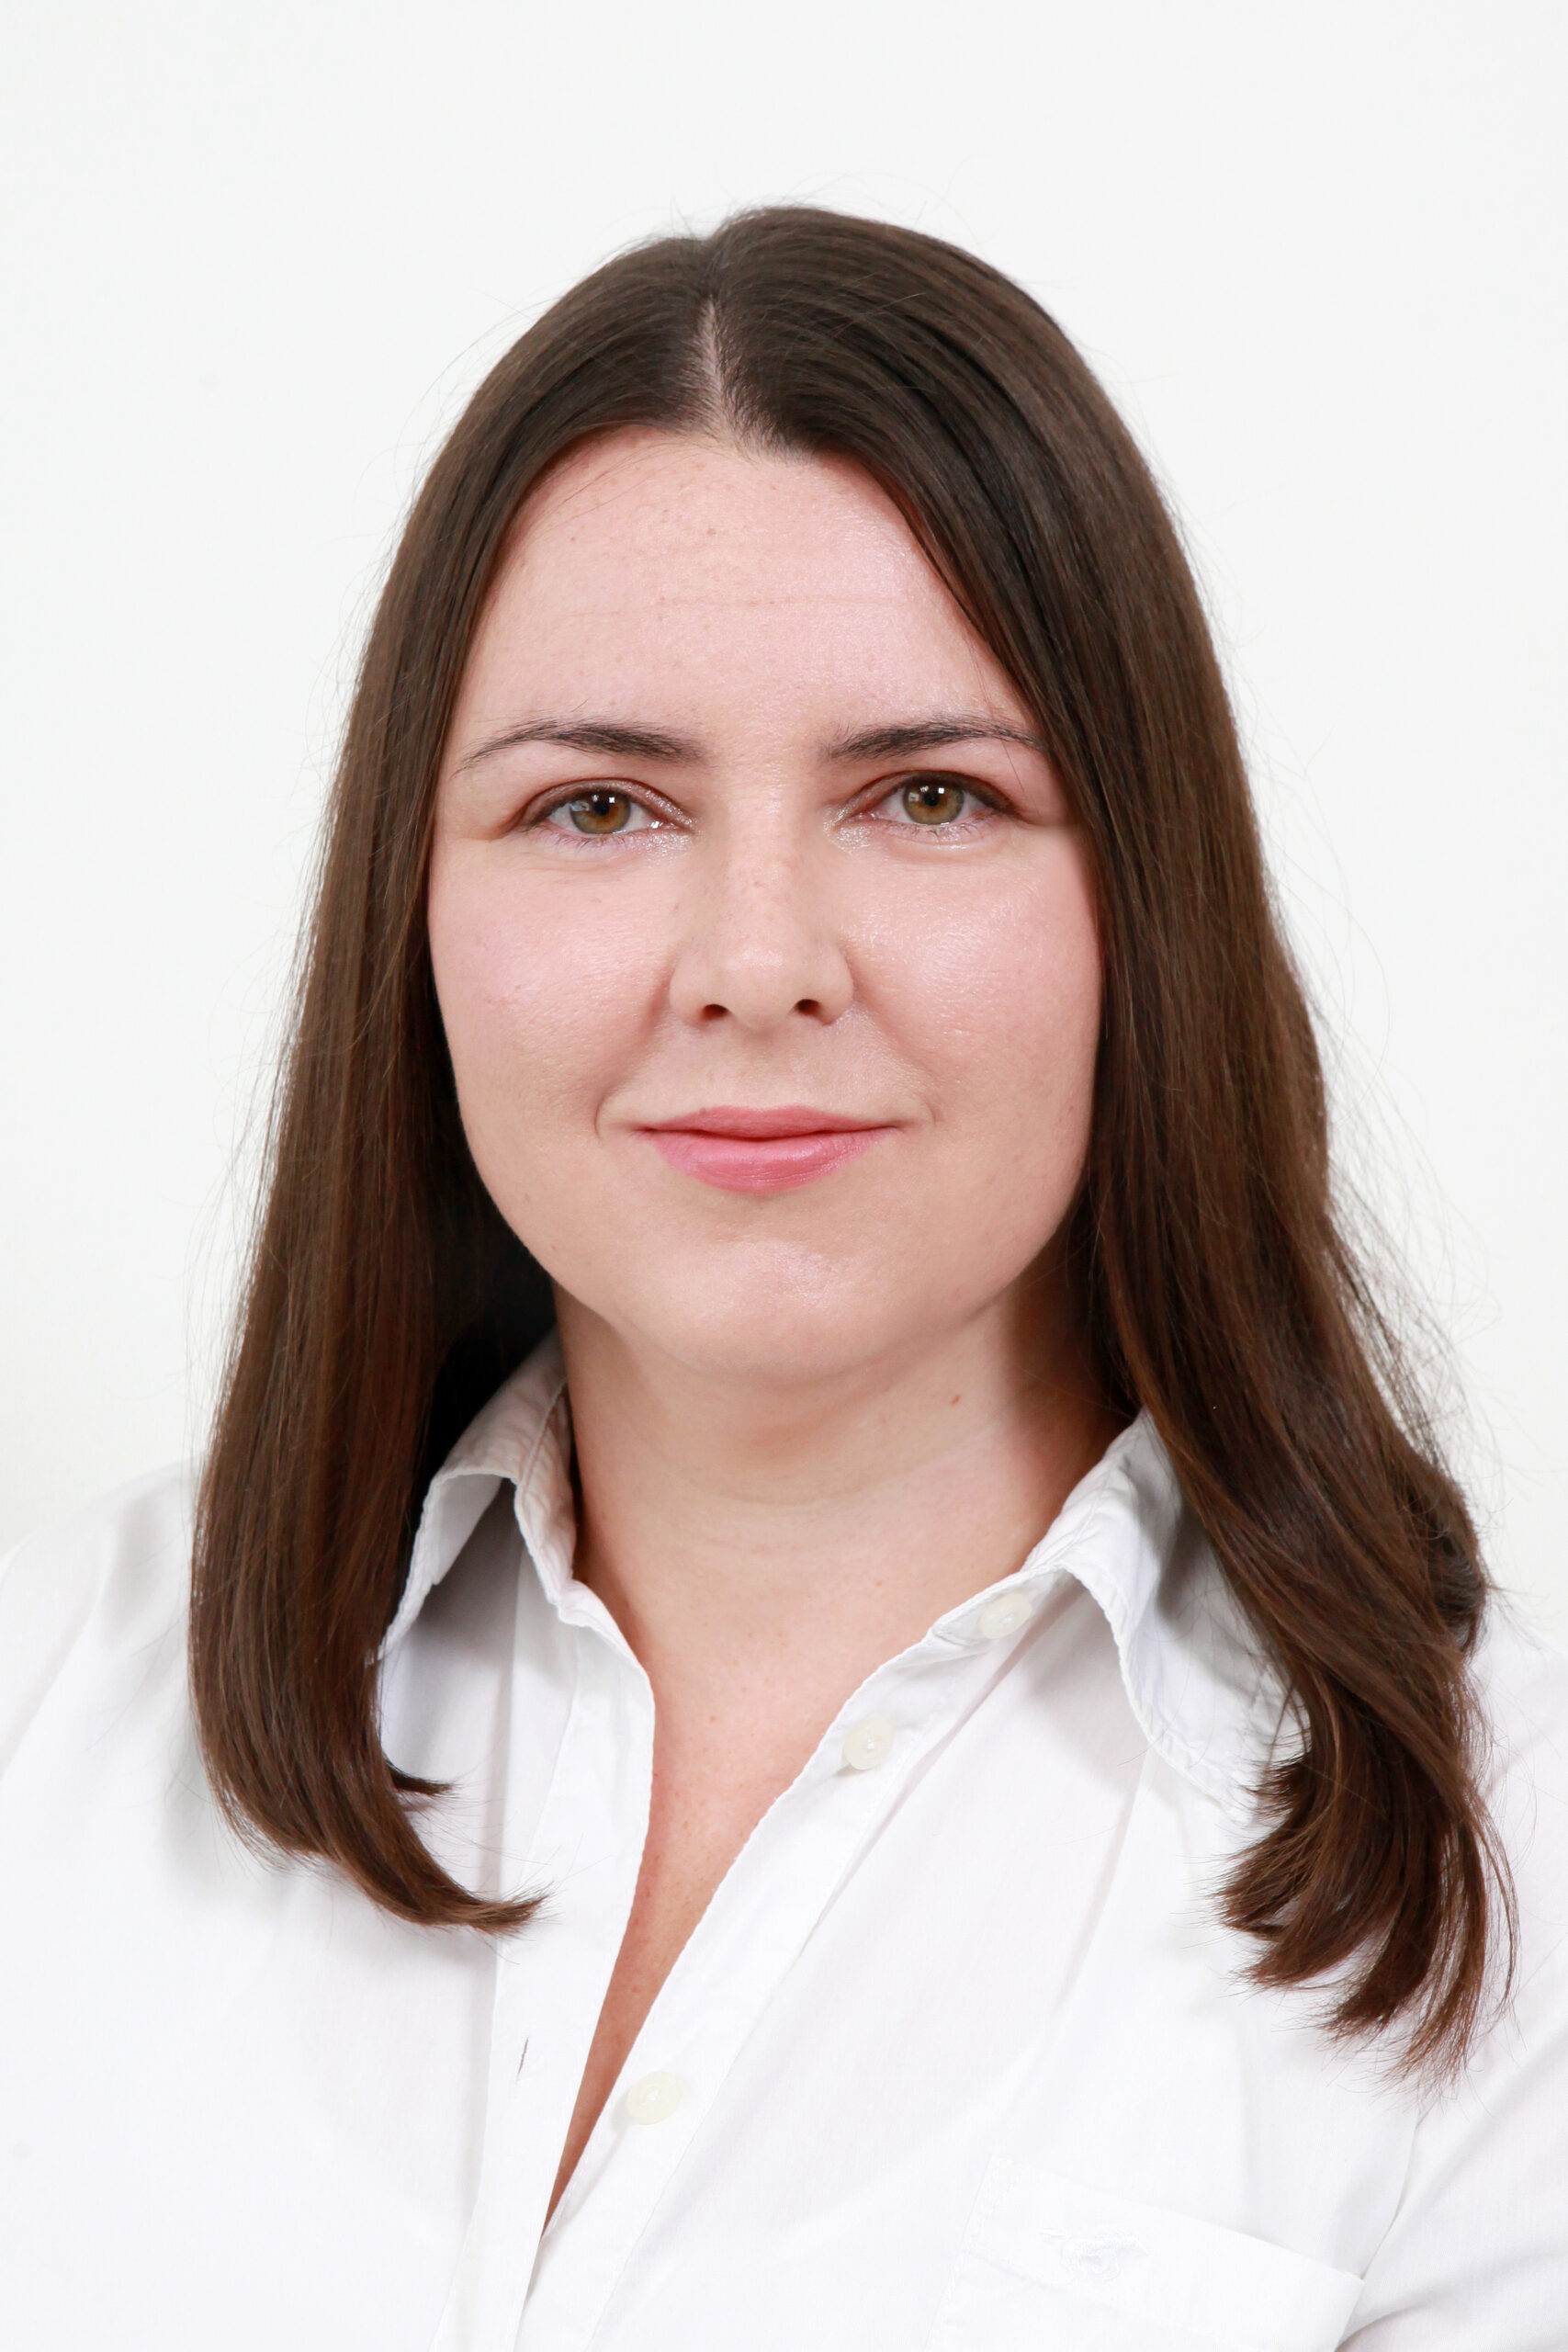 Željka Celinšćak, PhD